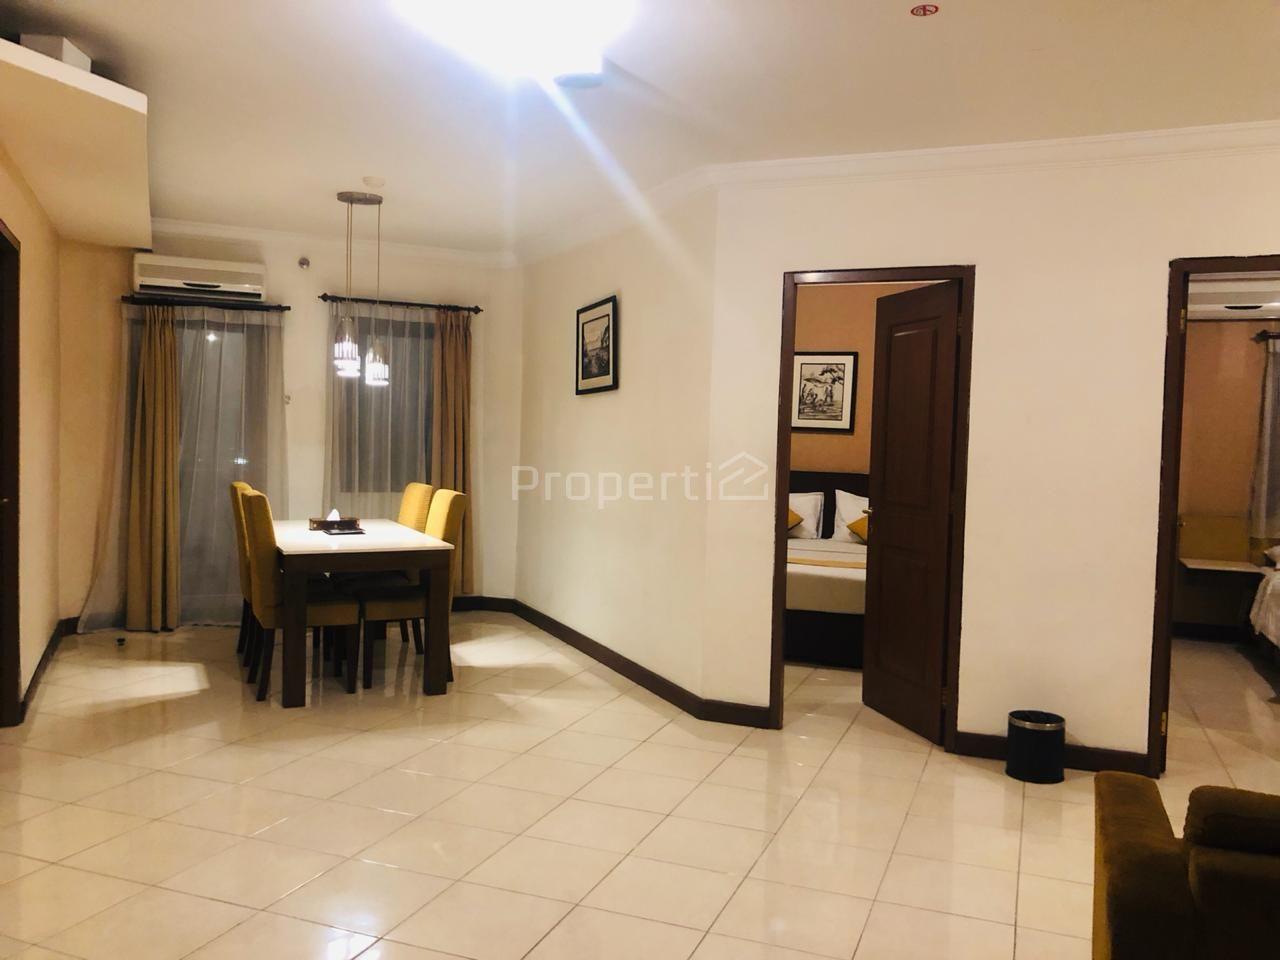 3BR Apartment Unit at The Majesty, 10th Floor, Jawa Barat